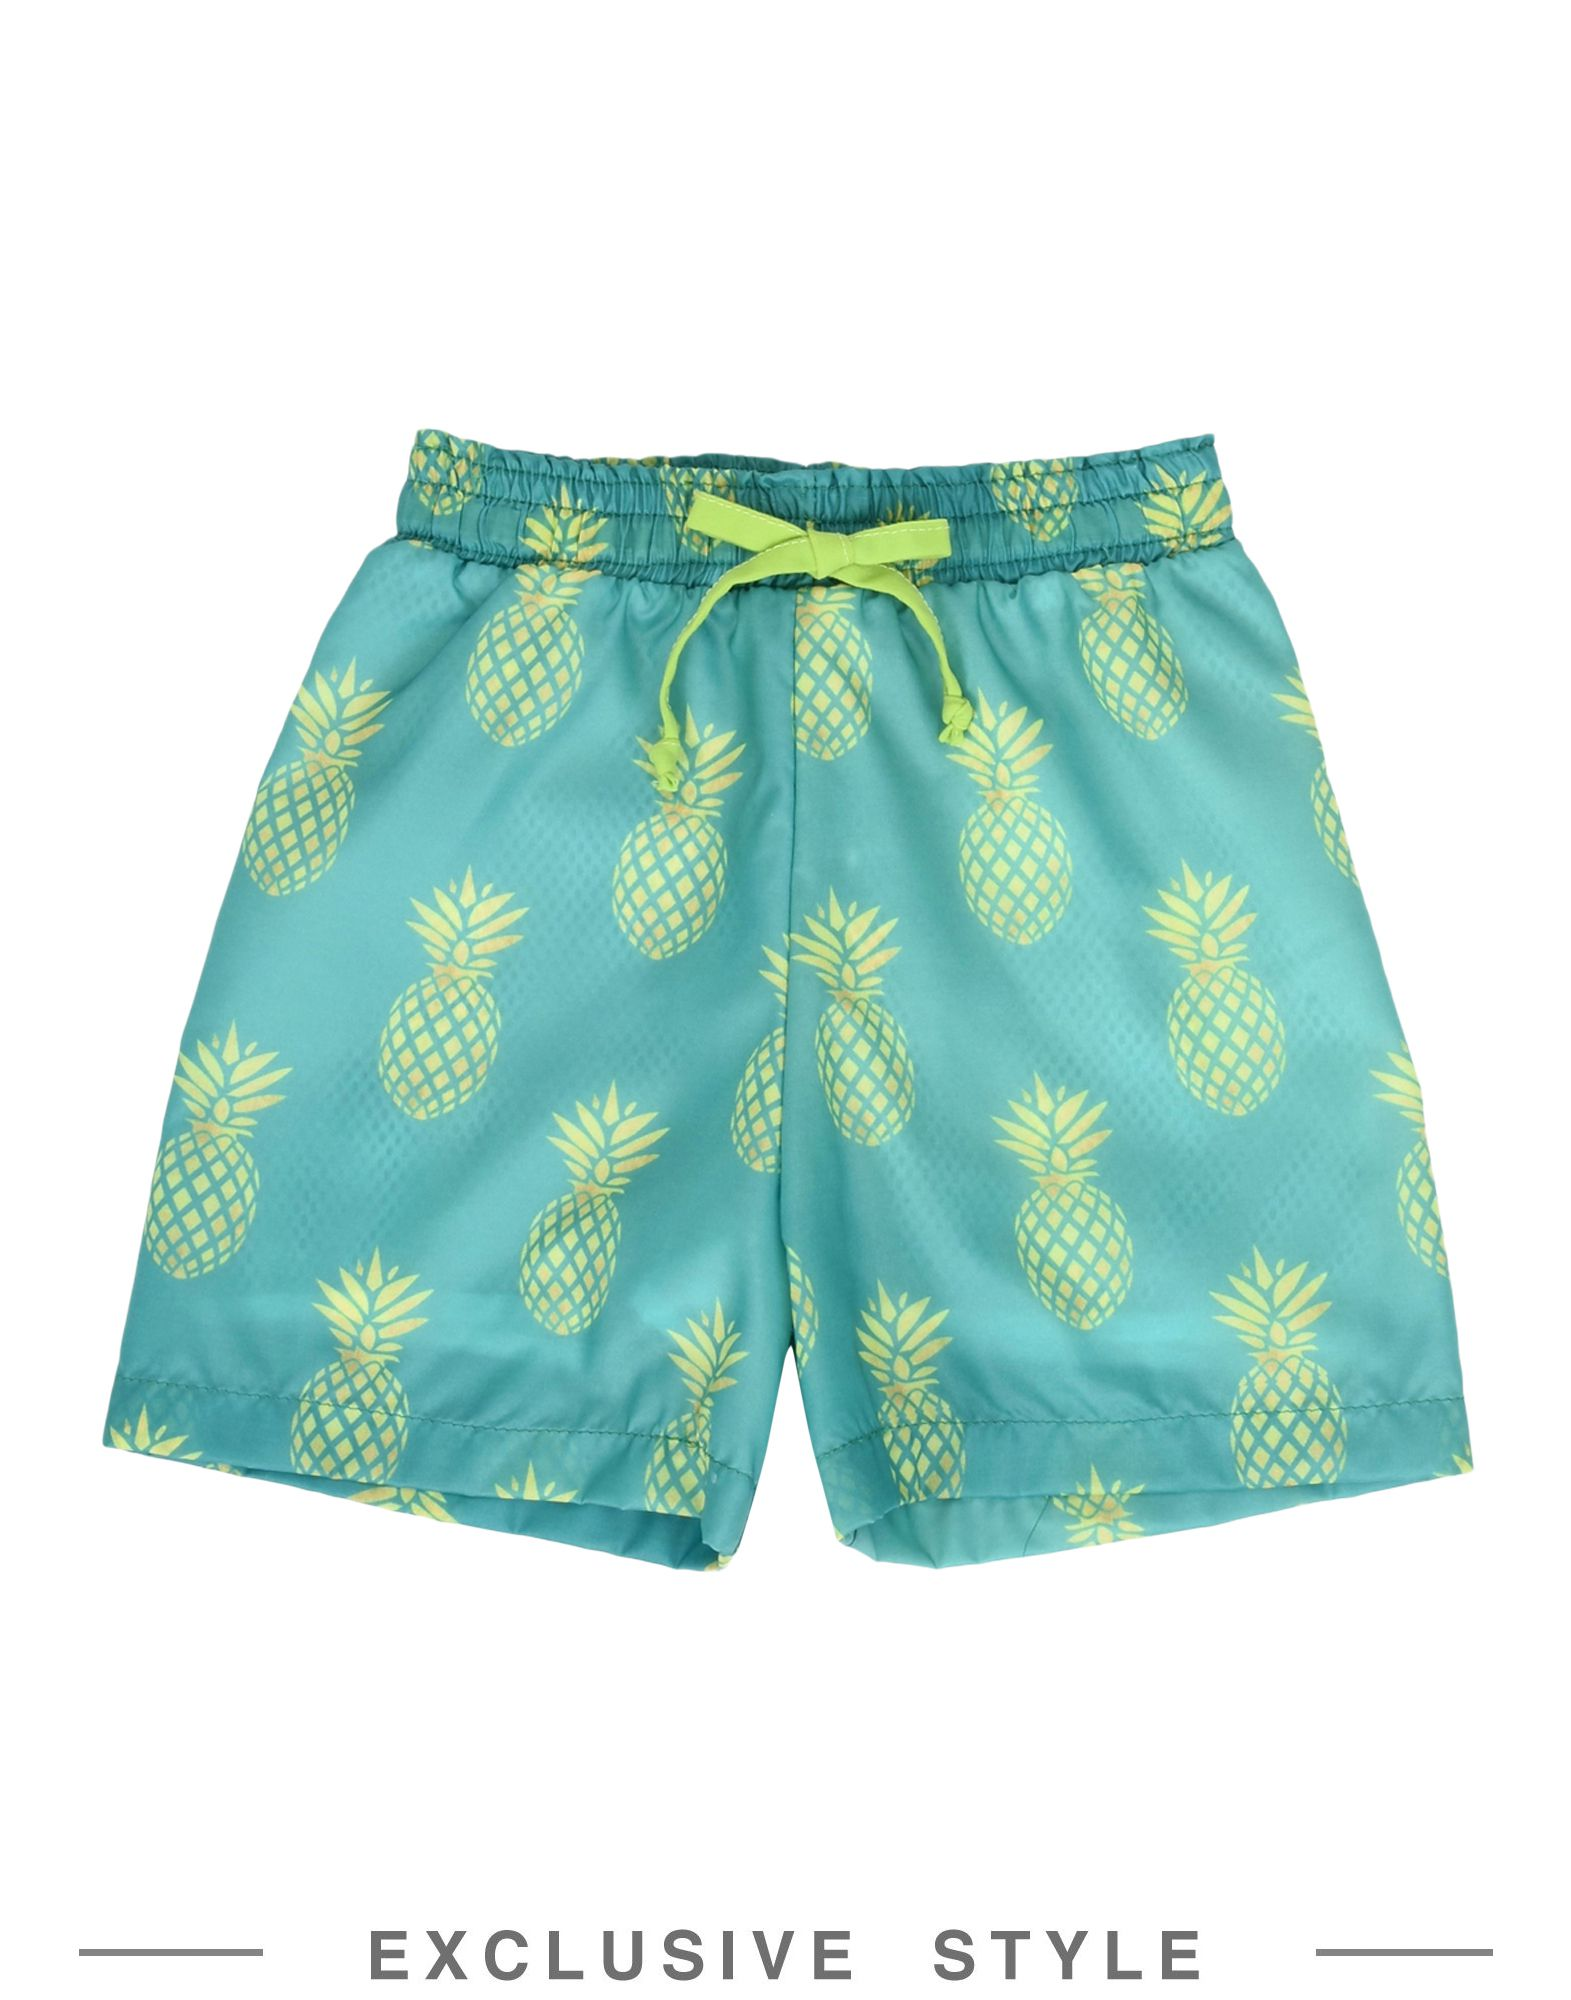 LES PETITES ABEILLES x YOOX Swim trunks